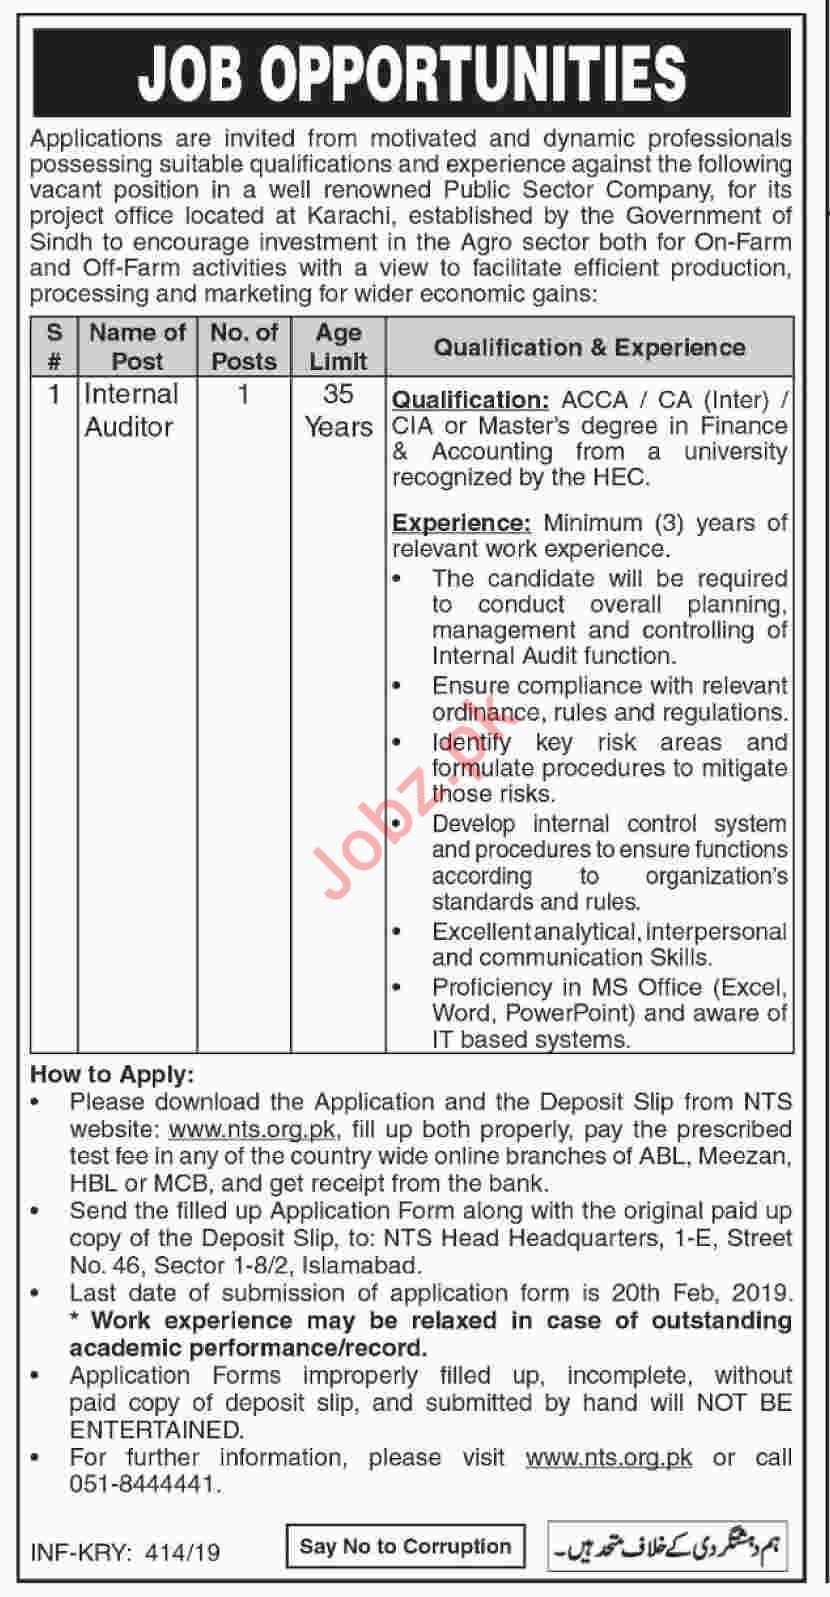 Public Sector Company Karachi Jobs 2019 for Internal Auditor